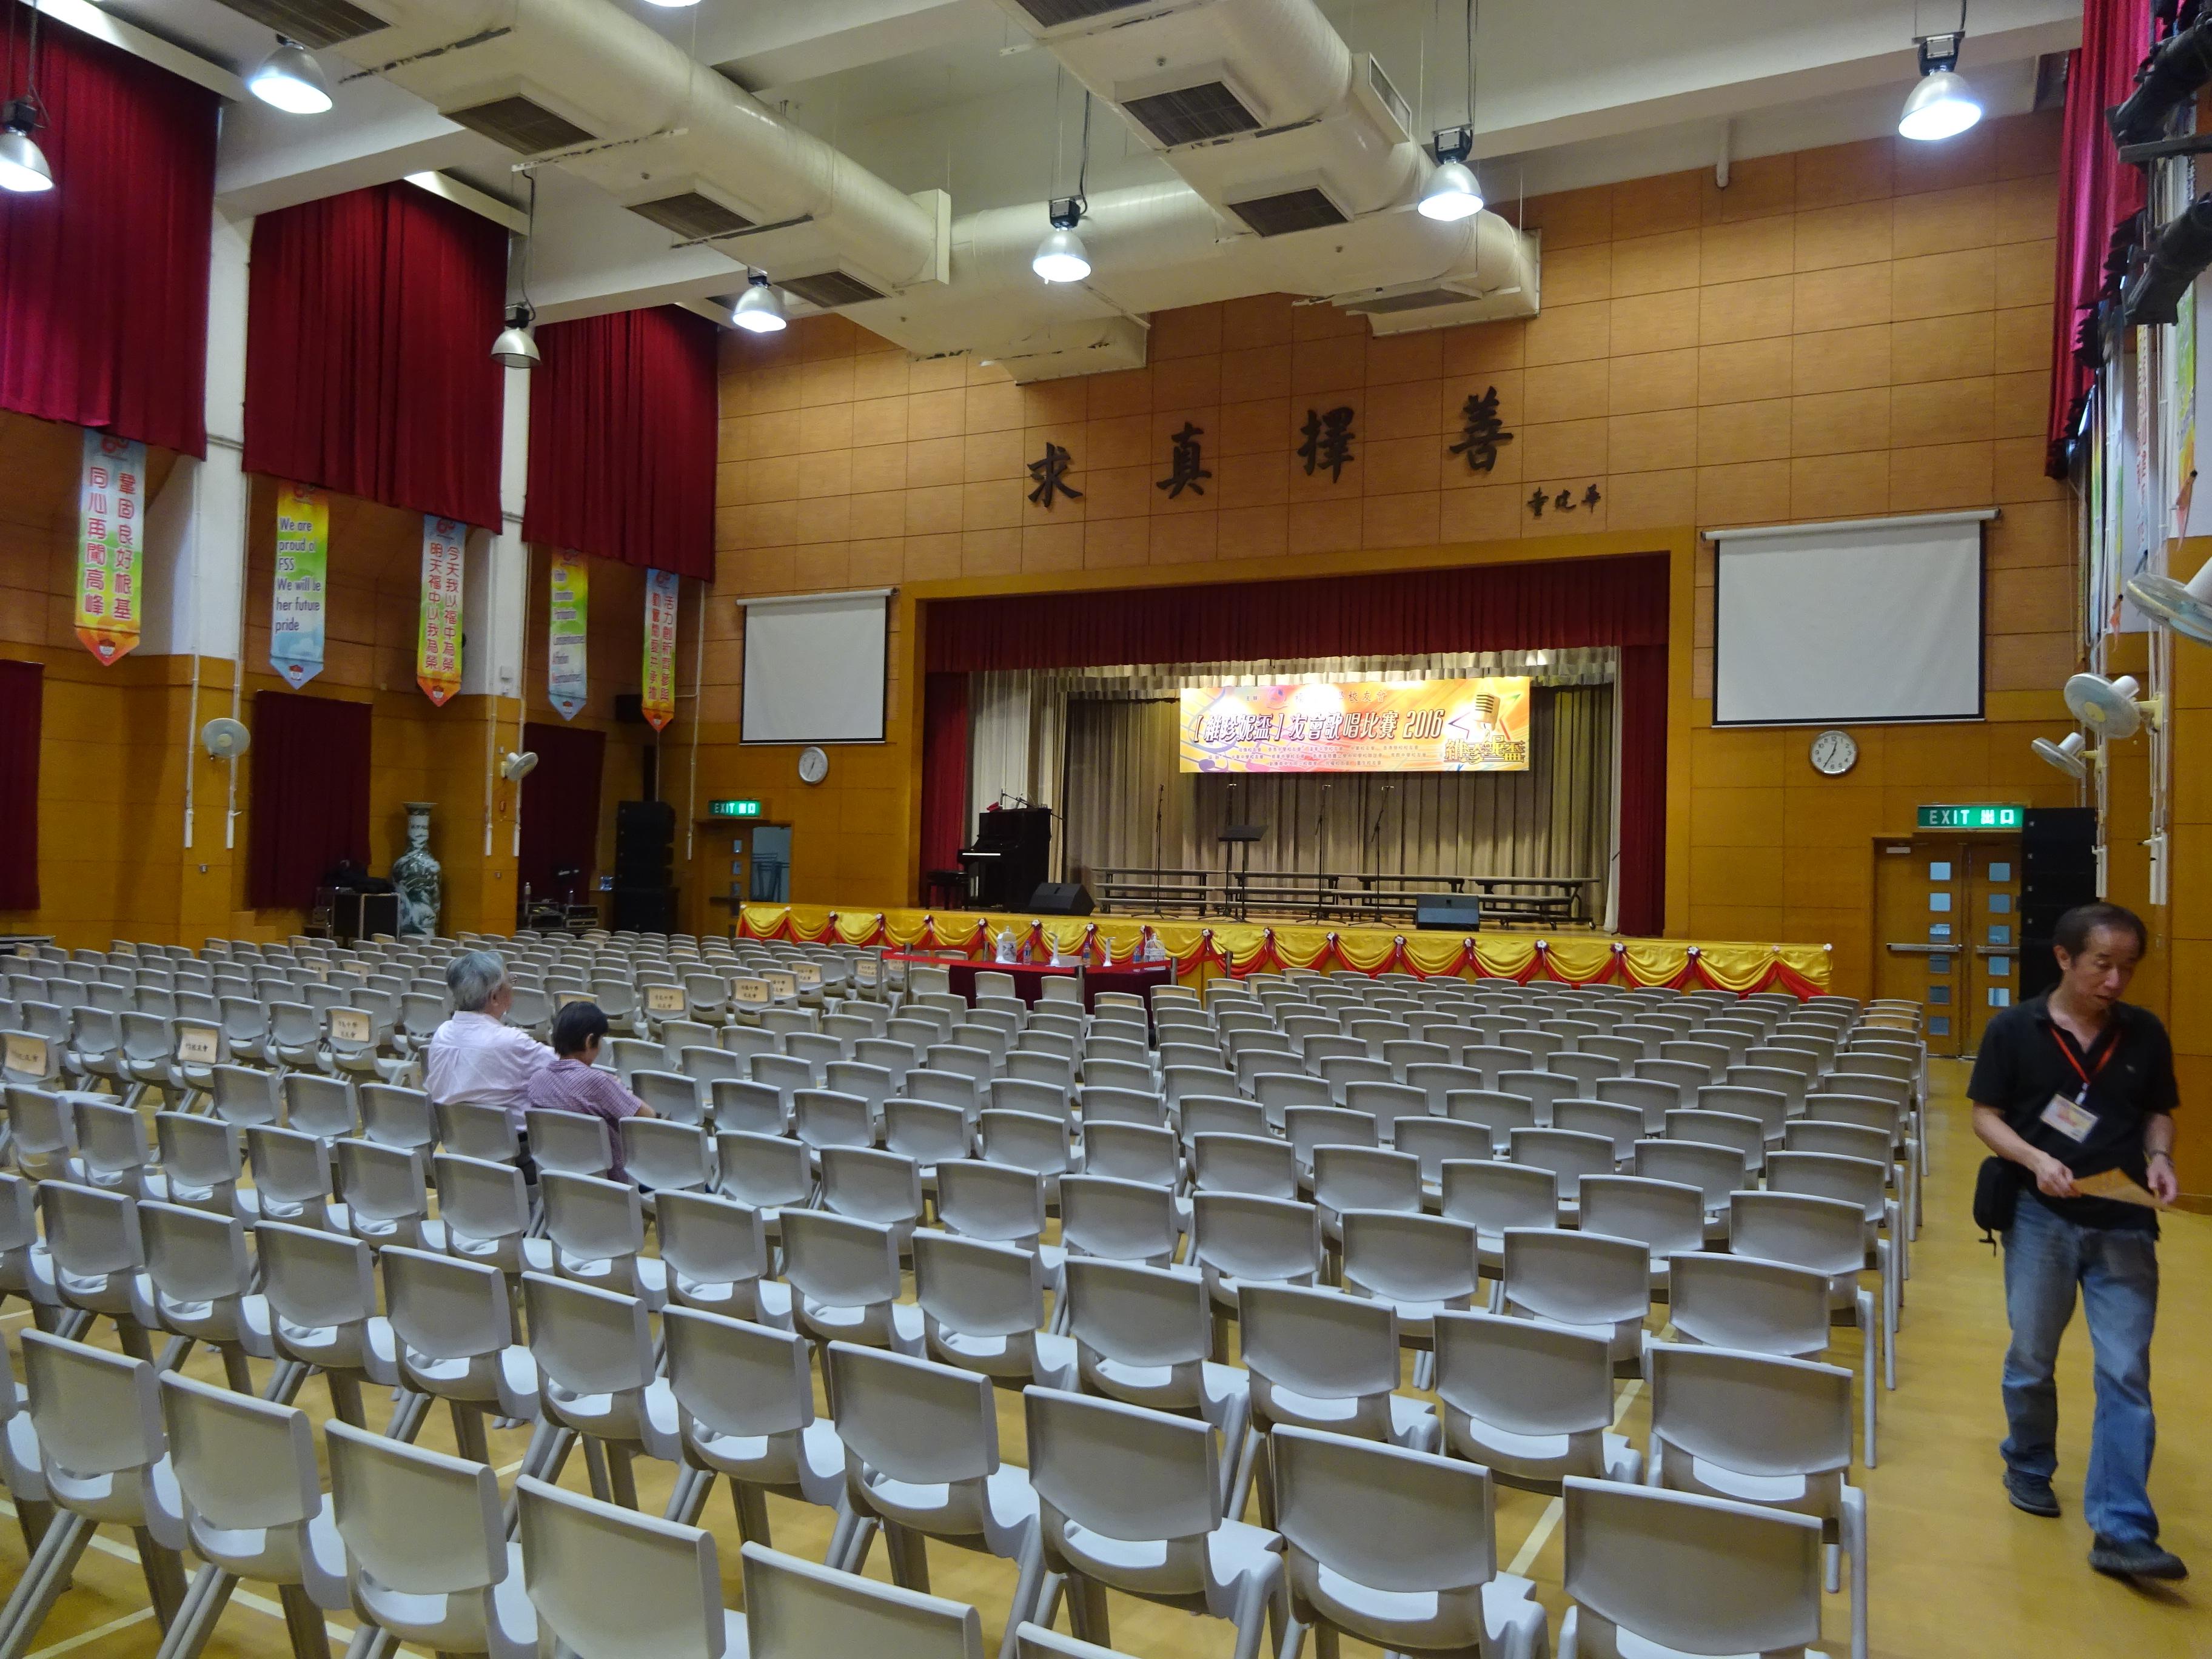 File:HK 福建中學 FSS FKSSch Fukien Secondary School grand hall interior row grey plastic chairs Sept 2016 DSC 03.jpg - Wikimedia Commons